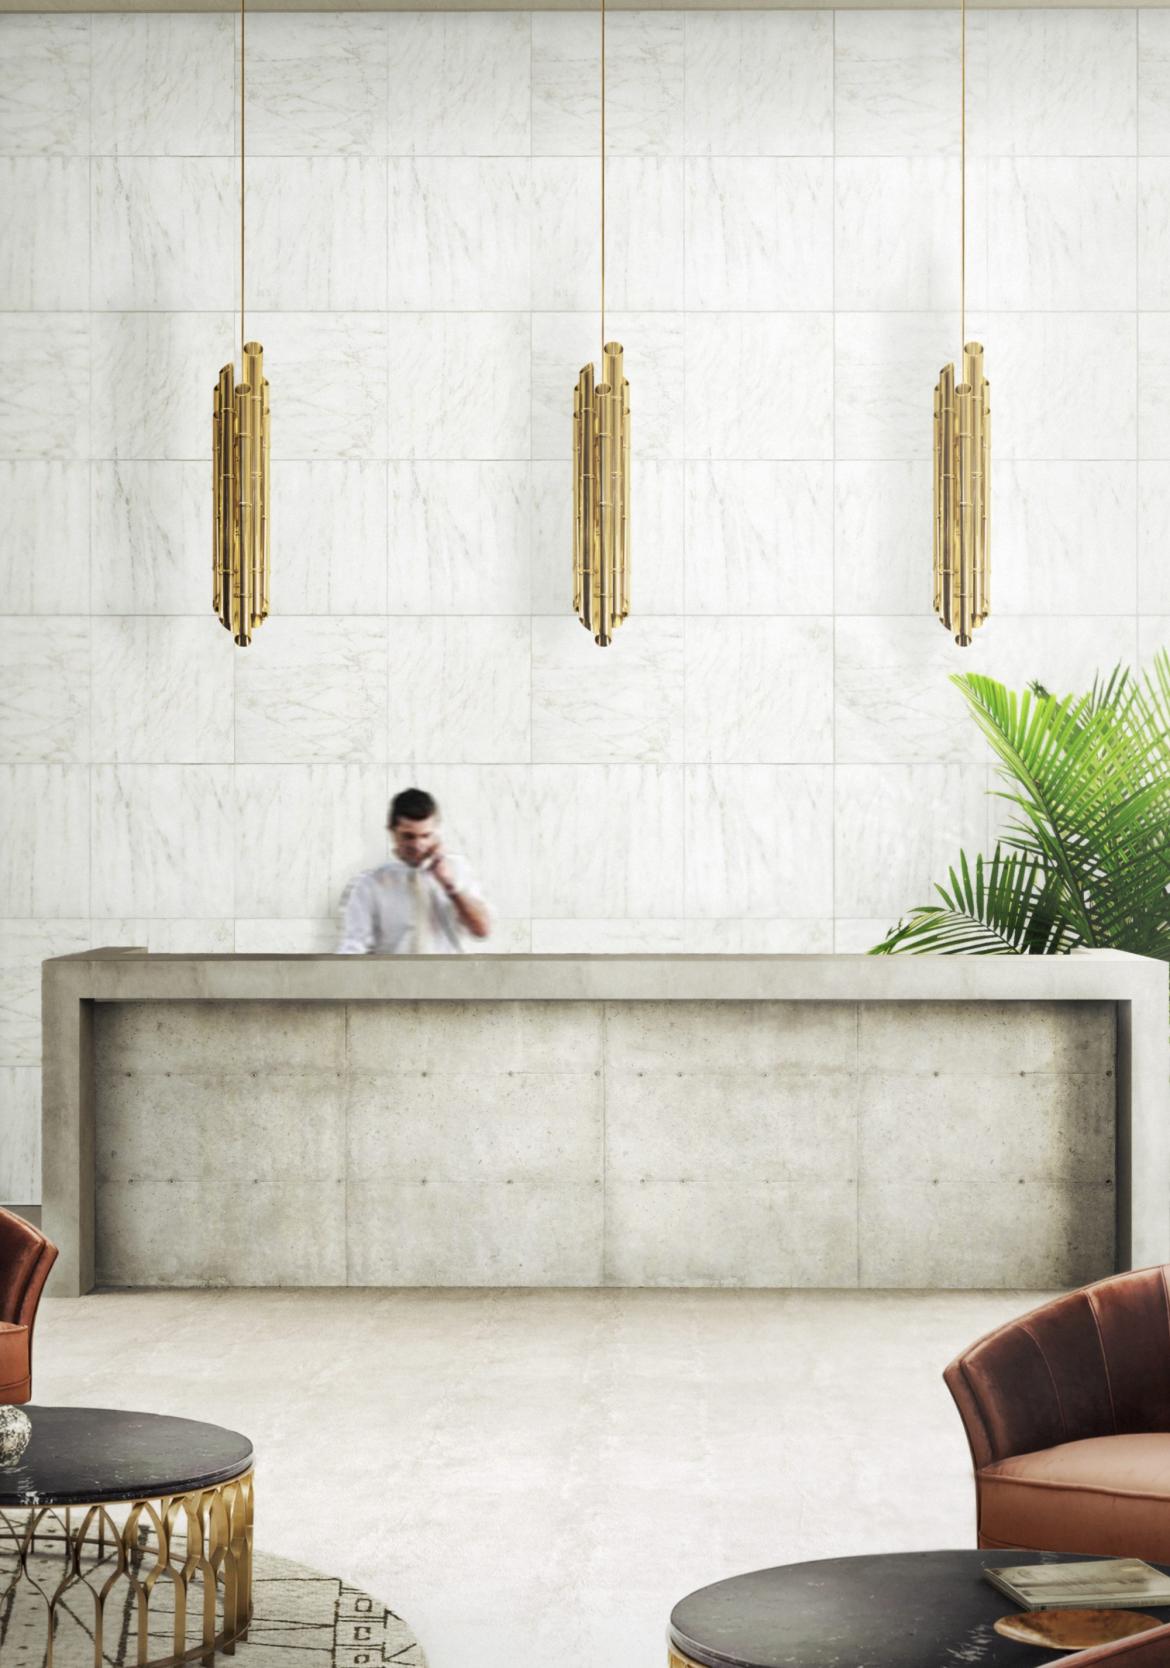 Amazing Interiors Design Tips From Inspiring Hotels interior design tips Amazing Interiors Design Tips From Inspiring Hotels Hotel Design Ideas 4